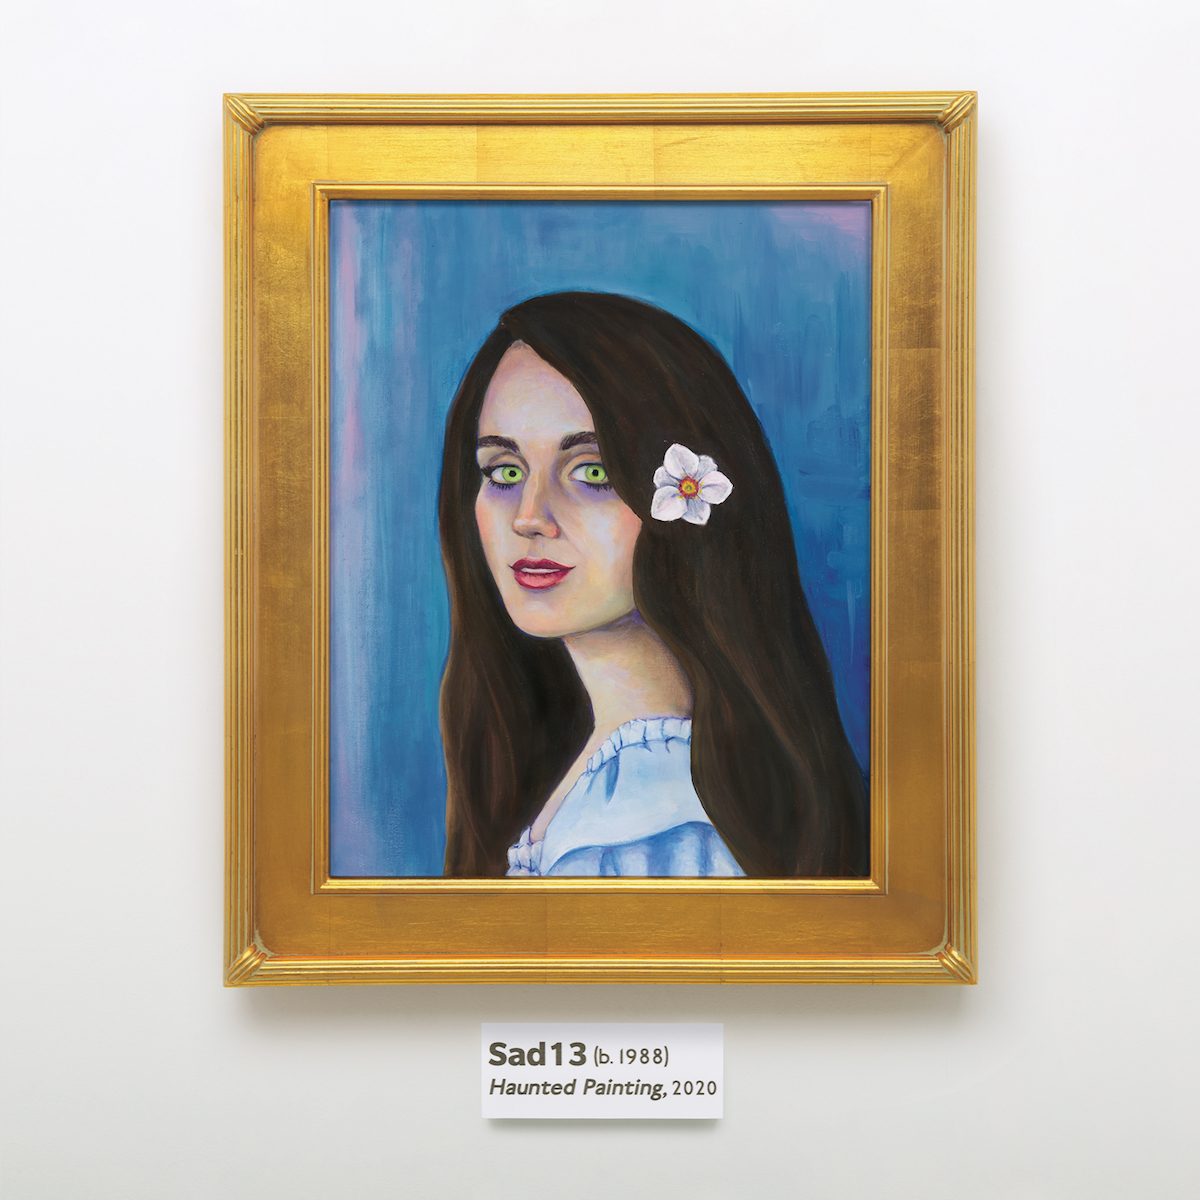 sad13 haunted painting album artwork cover Sadie Dupuis Sad13 Announces New Album Haunted Painting, Shares Ghost (of a Good Time): Stream